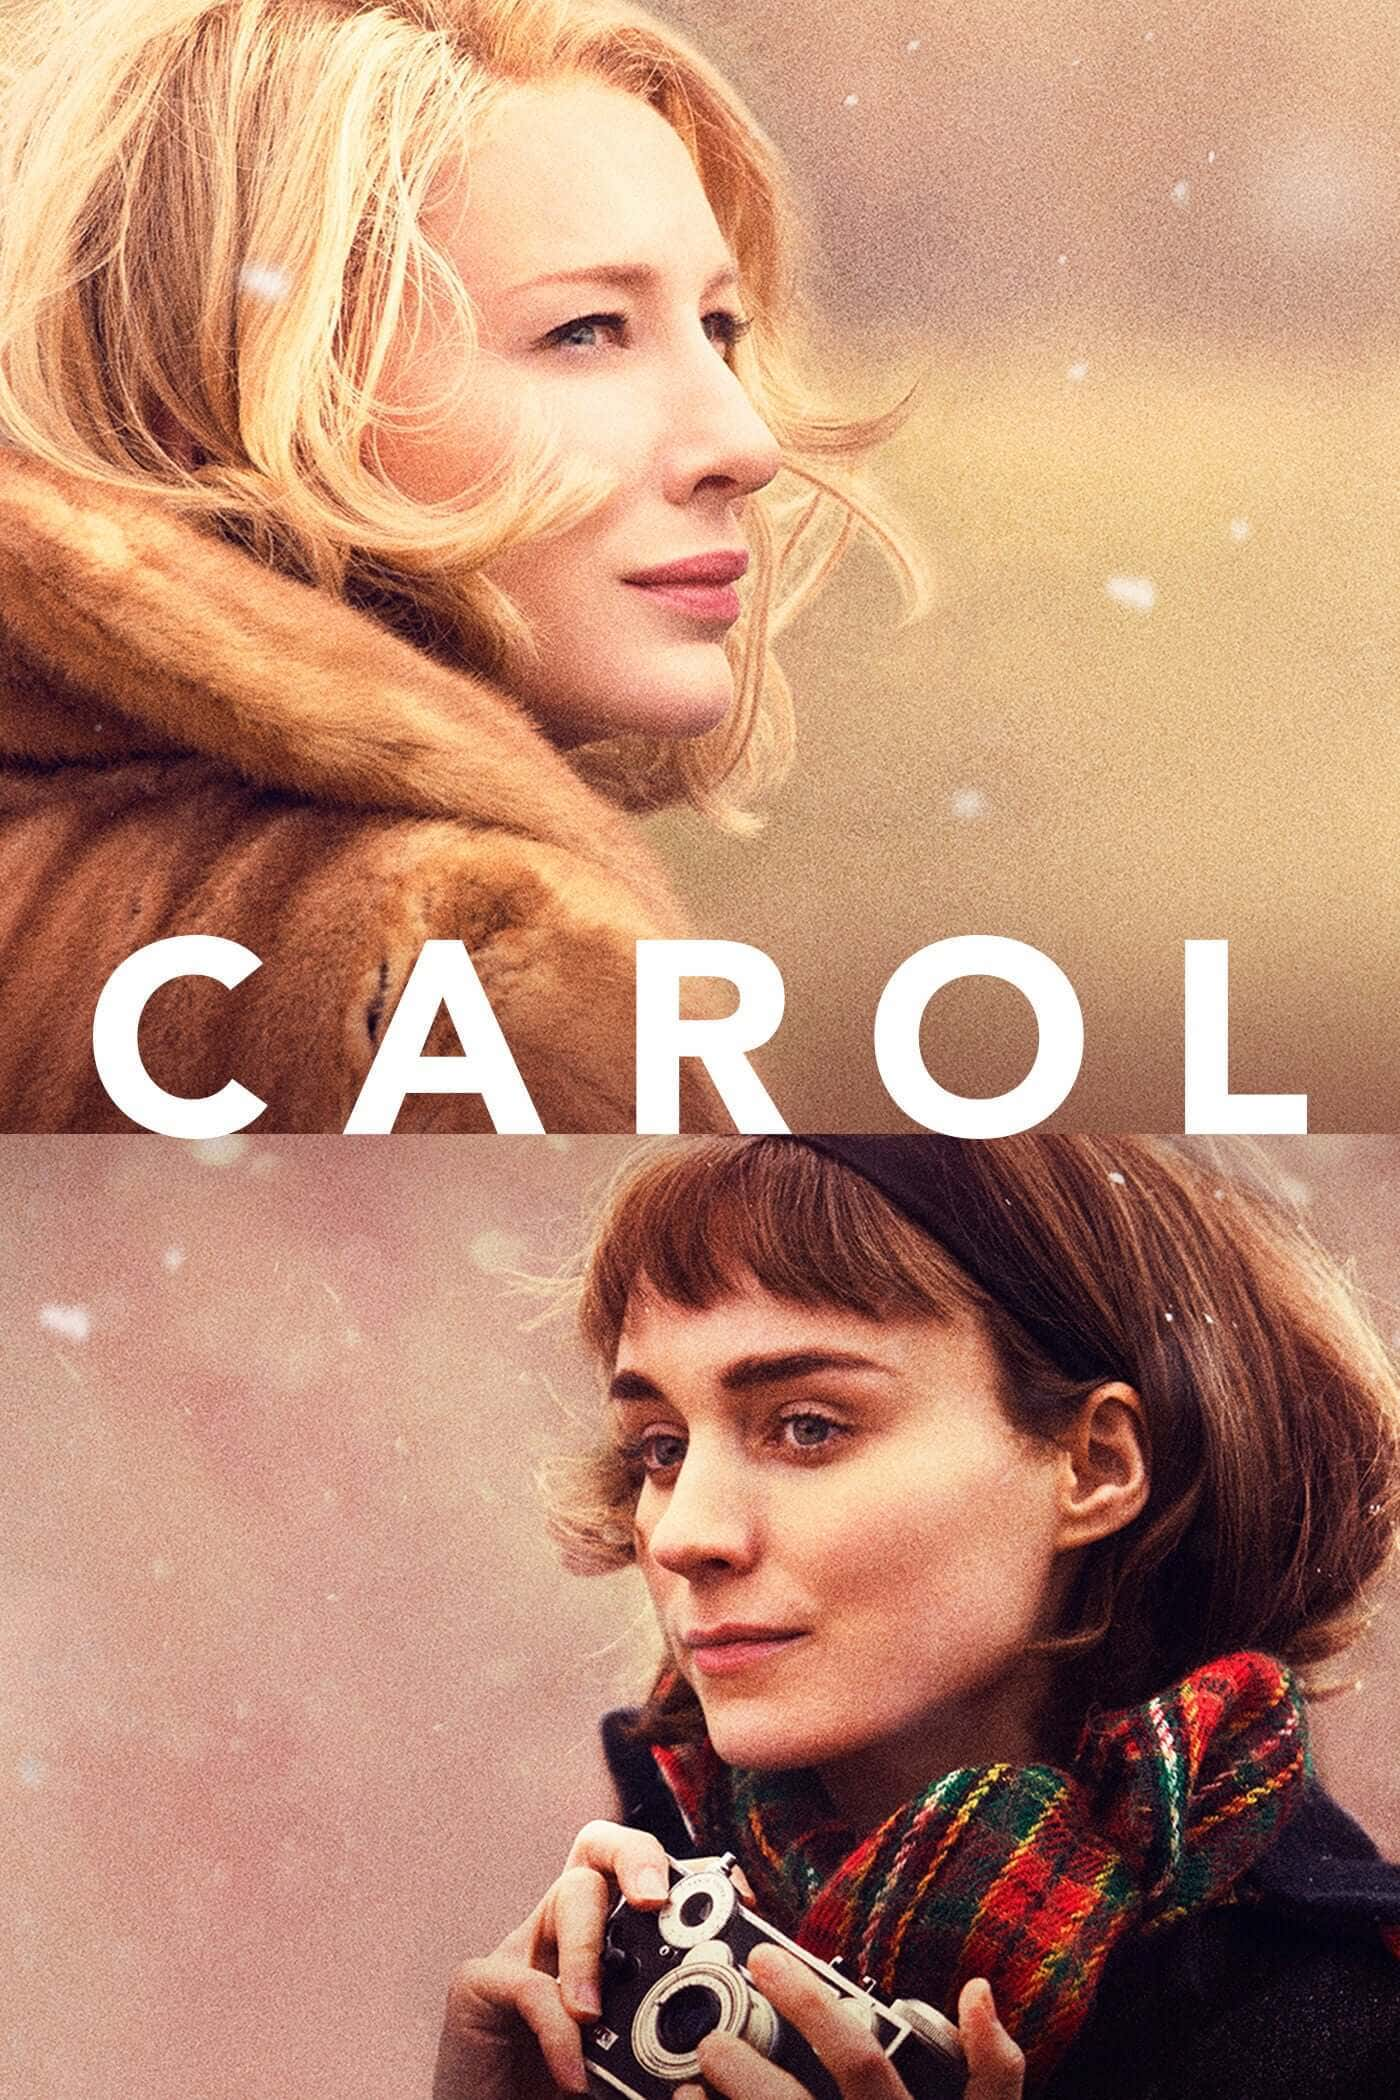 carol 2015 torrent download